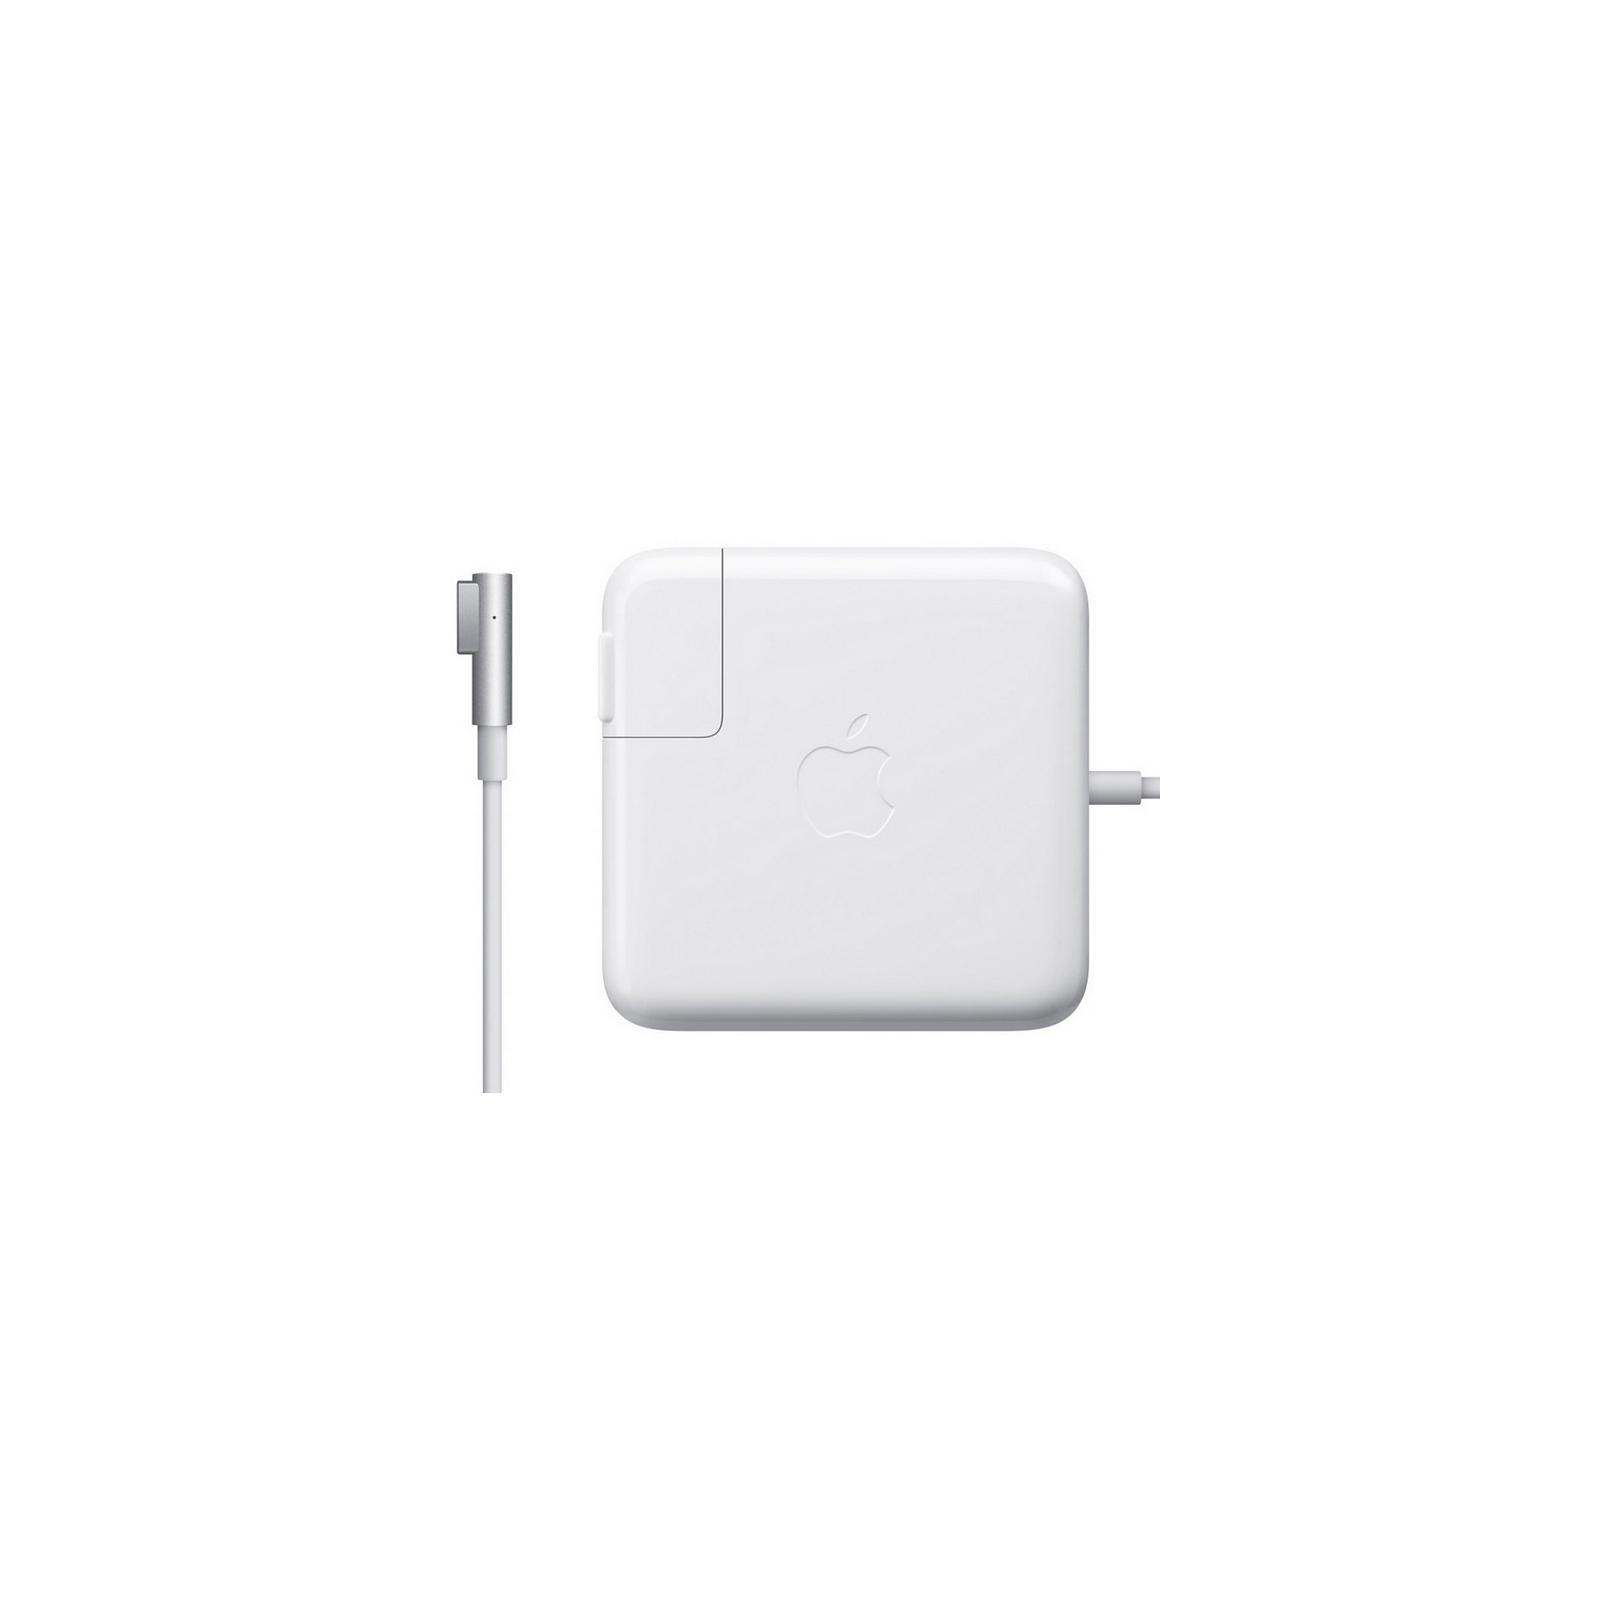 Блок питания к ноутбуку MagSafe Power Adapter Apple (MC556Z/B)